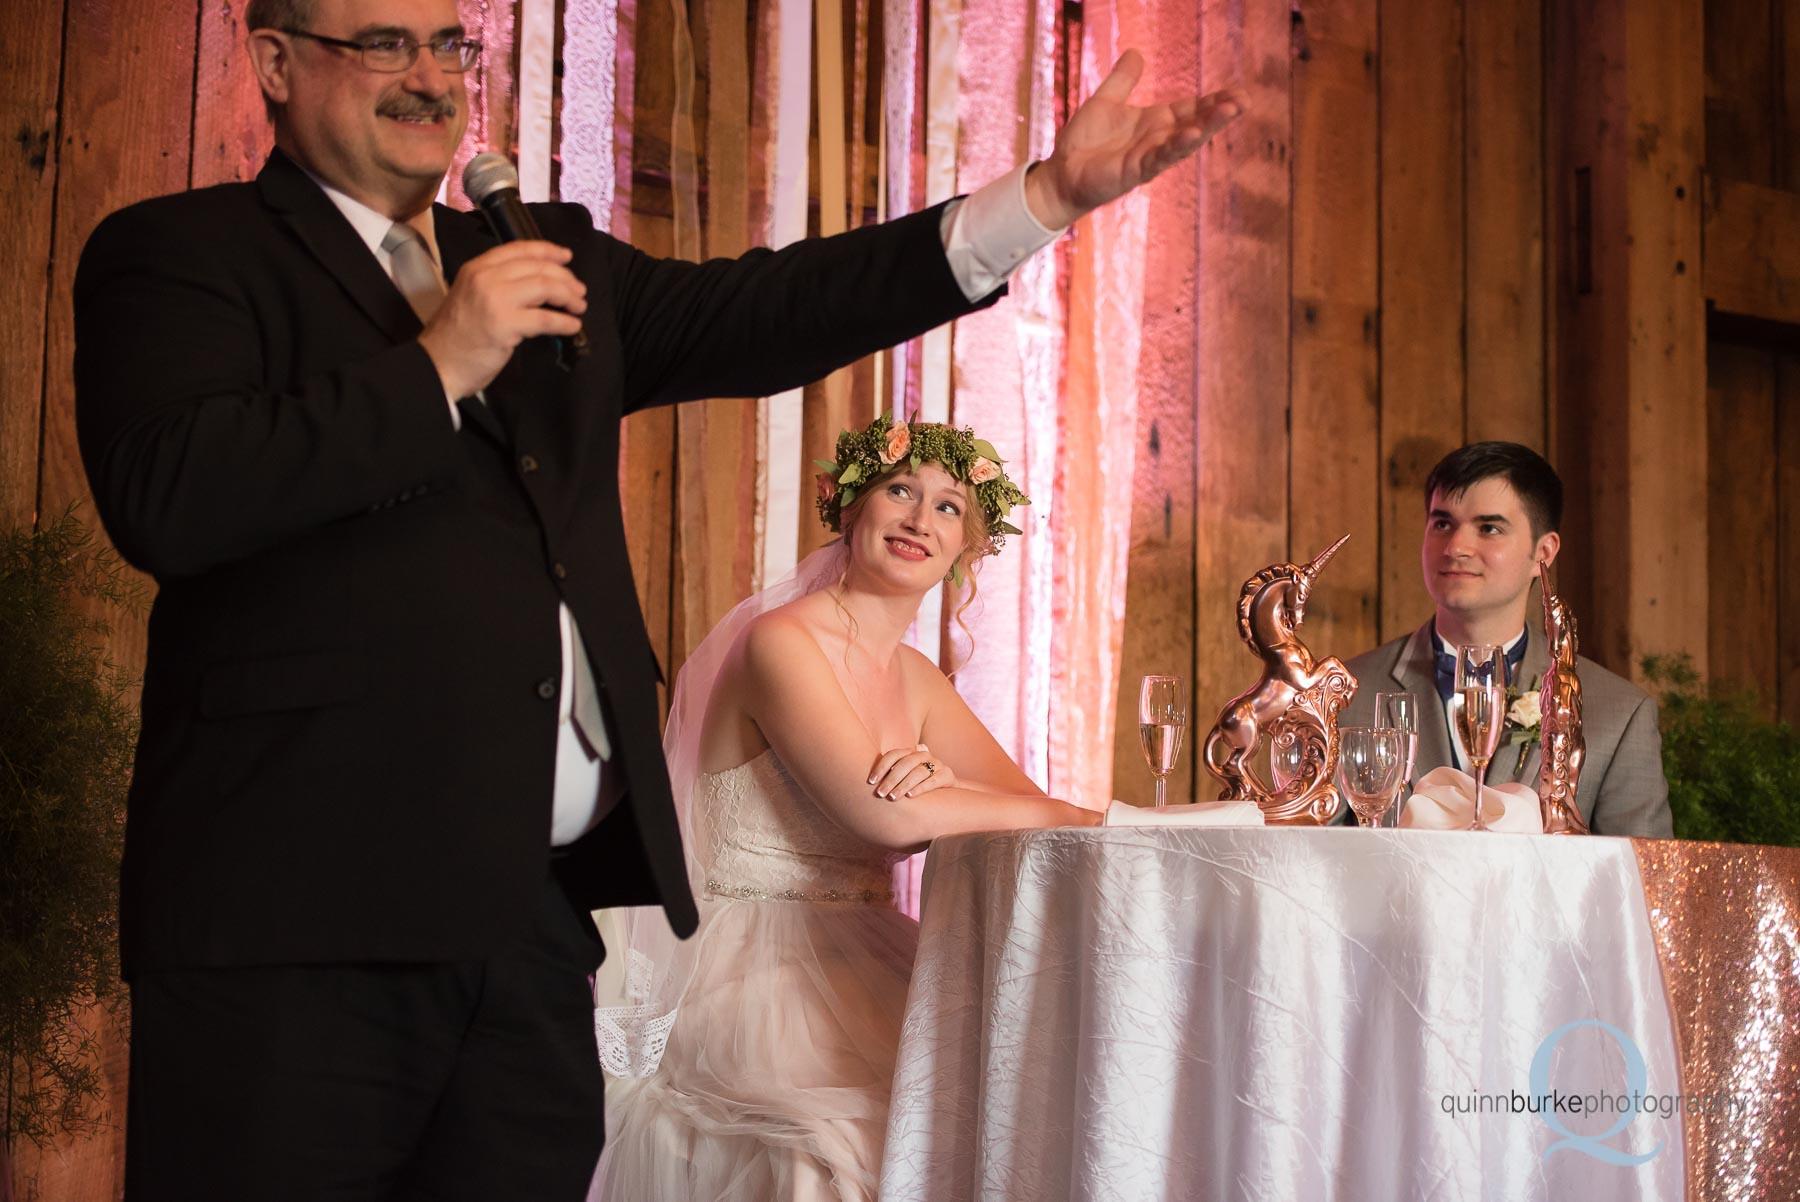 father of groom toast at wedding reception at Perryhill Farm barn oregon